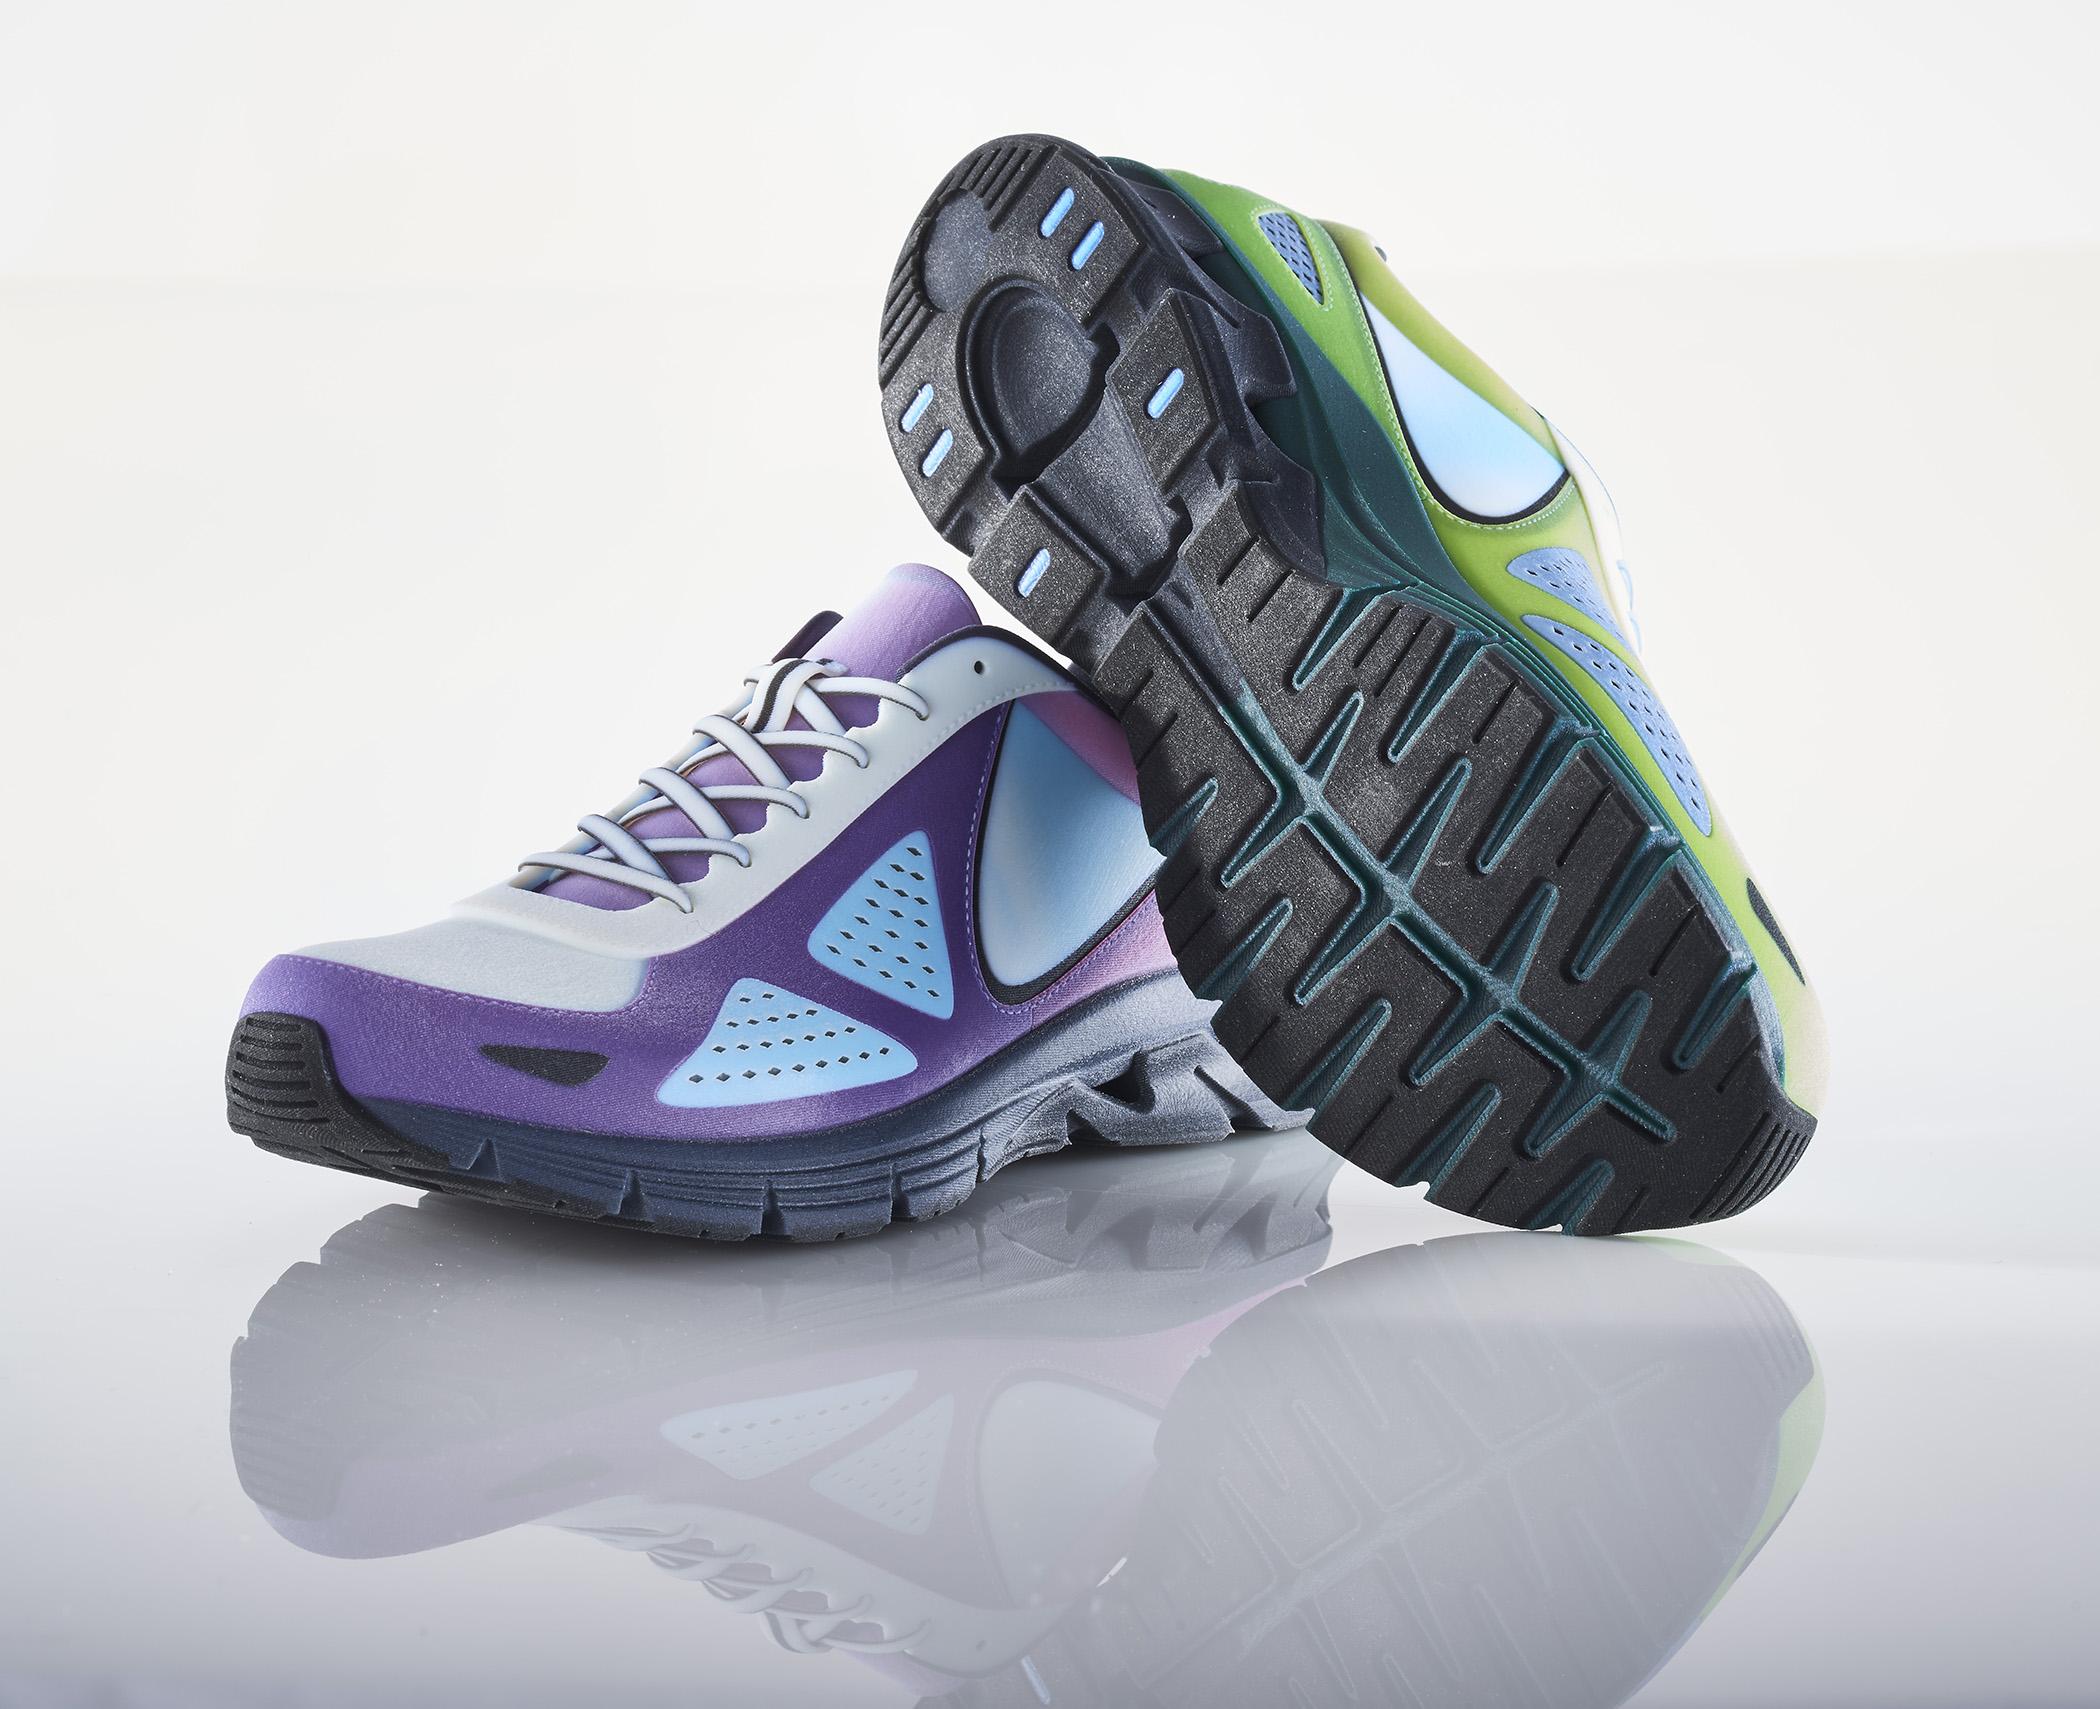 J750 3D Printed Tennis Shoes - Purple Platypus